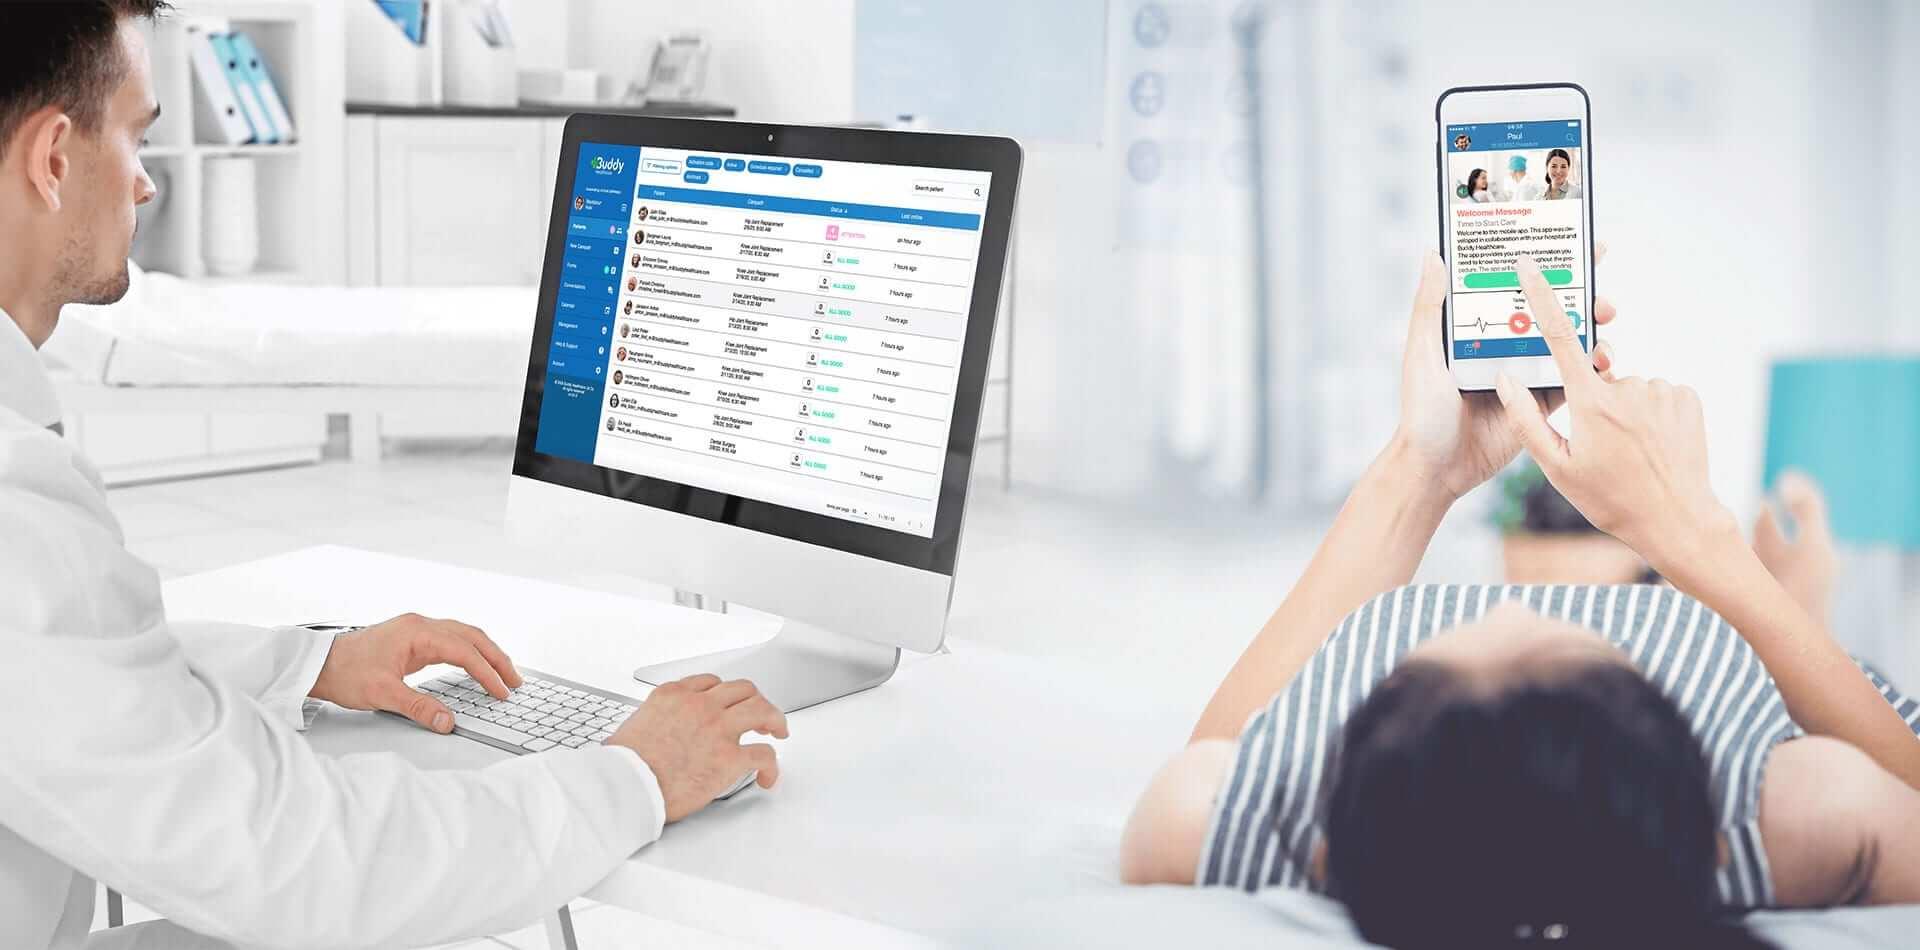 Digital-Patient-Engagement-and-Care-Coordination-Platform-min